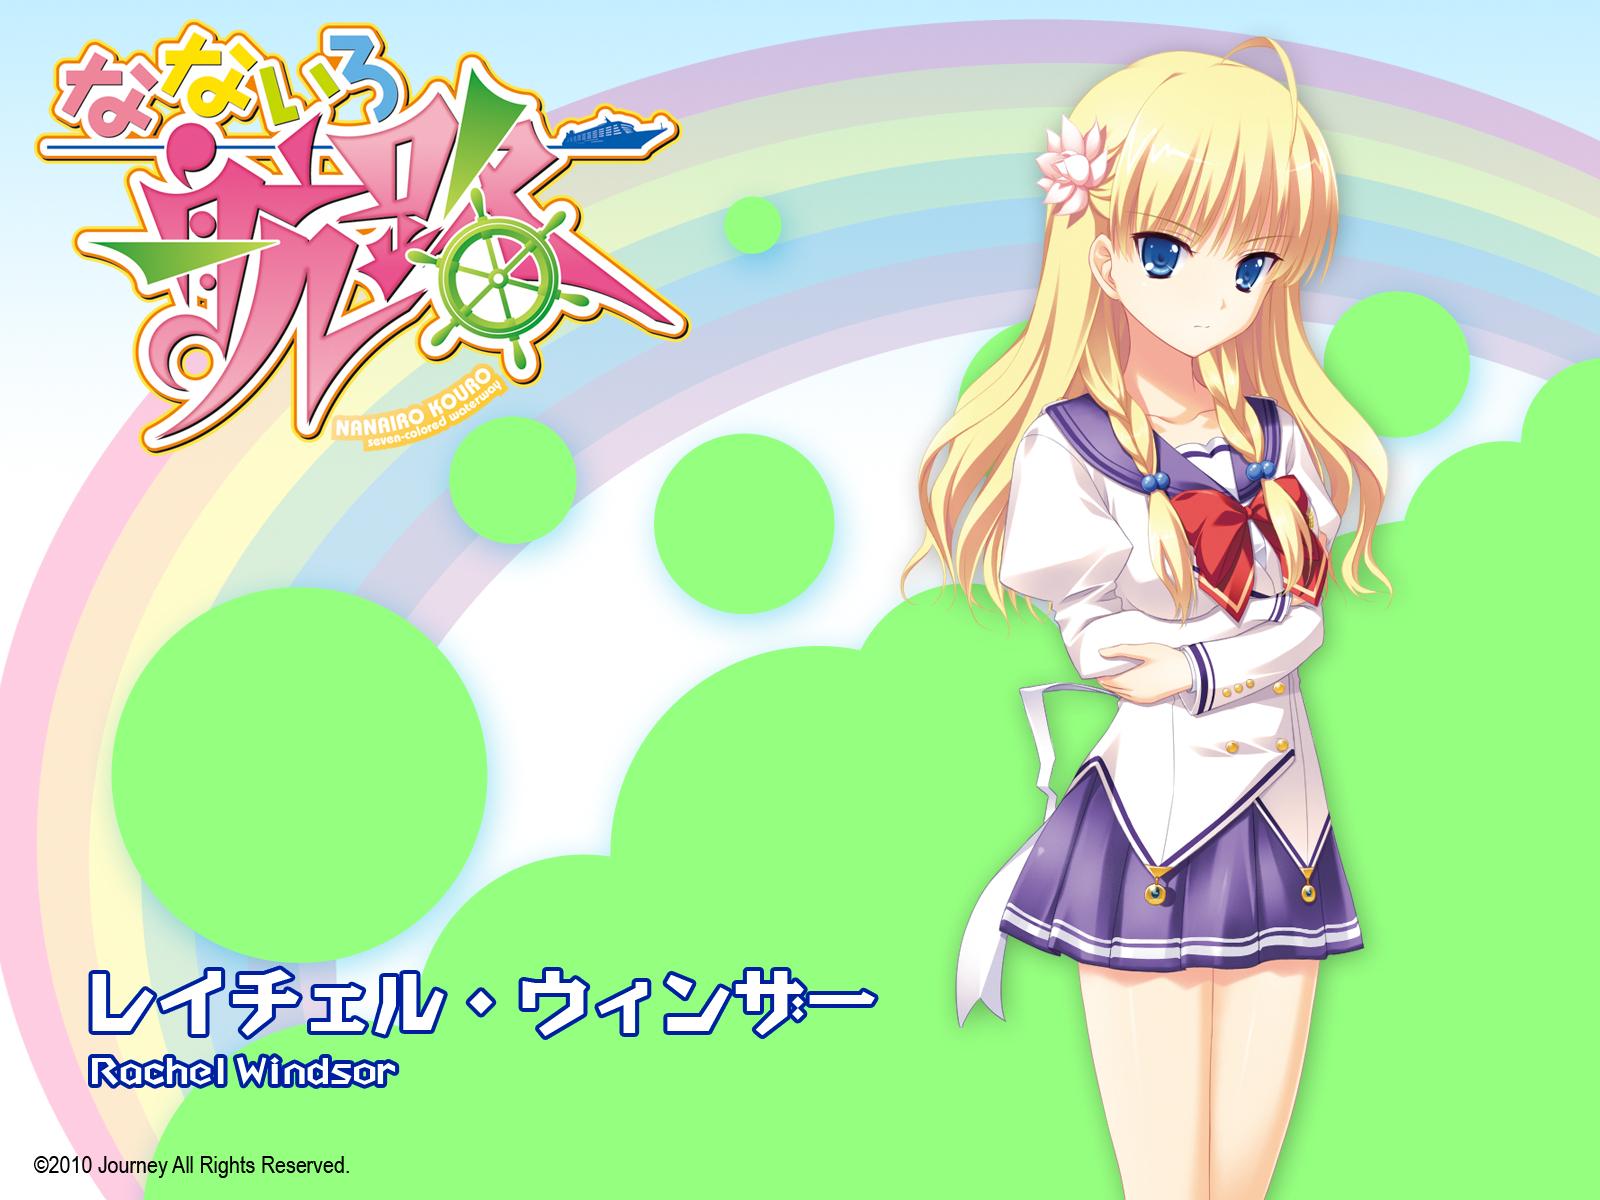 blonde_hair blue_eyes braids flowers journey long_hair nanairo_kouro rachel_windsor rakko school_uniform